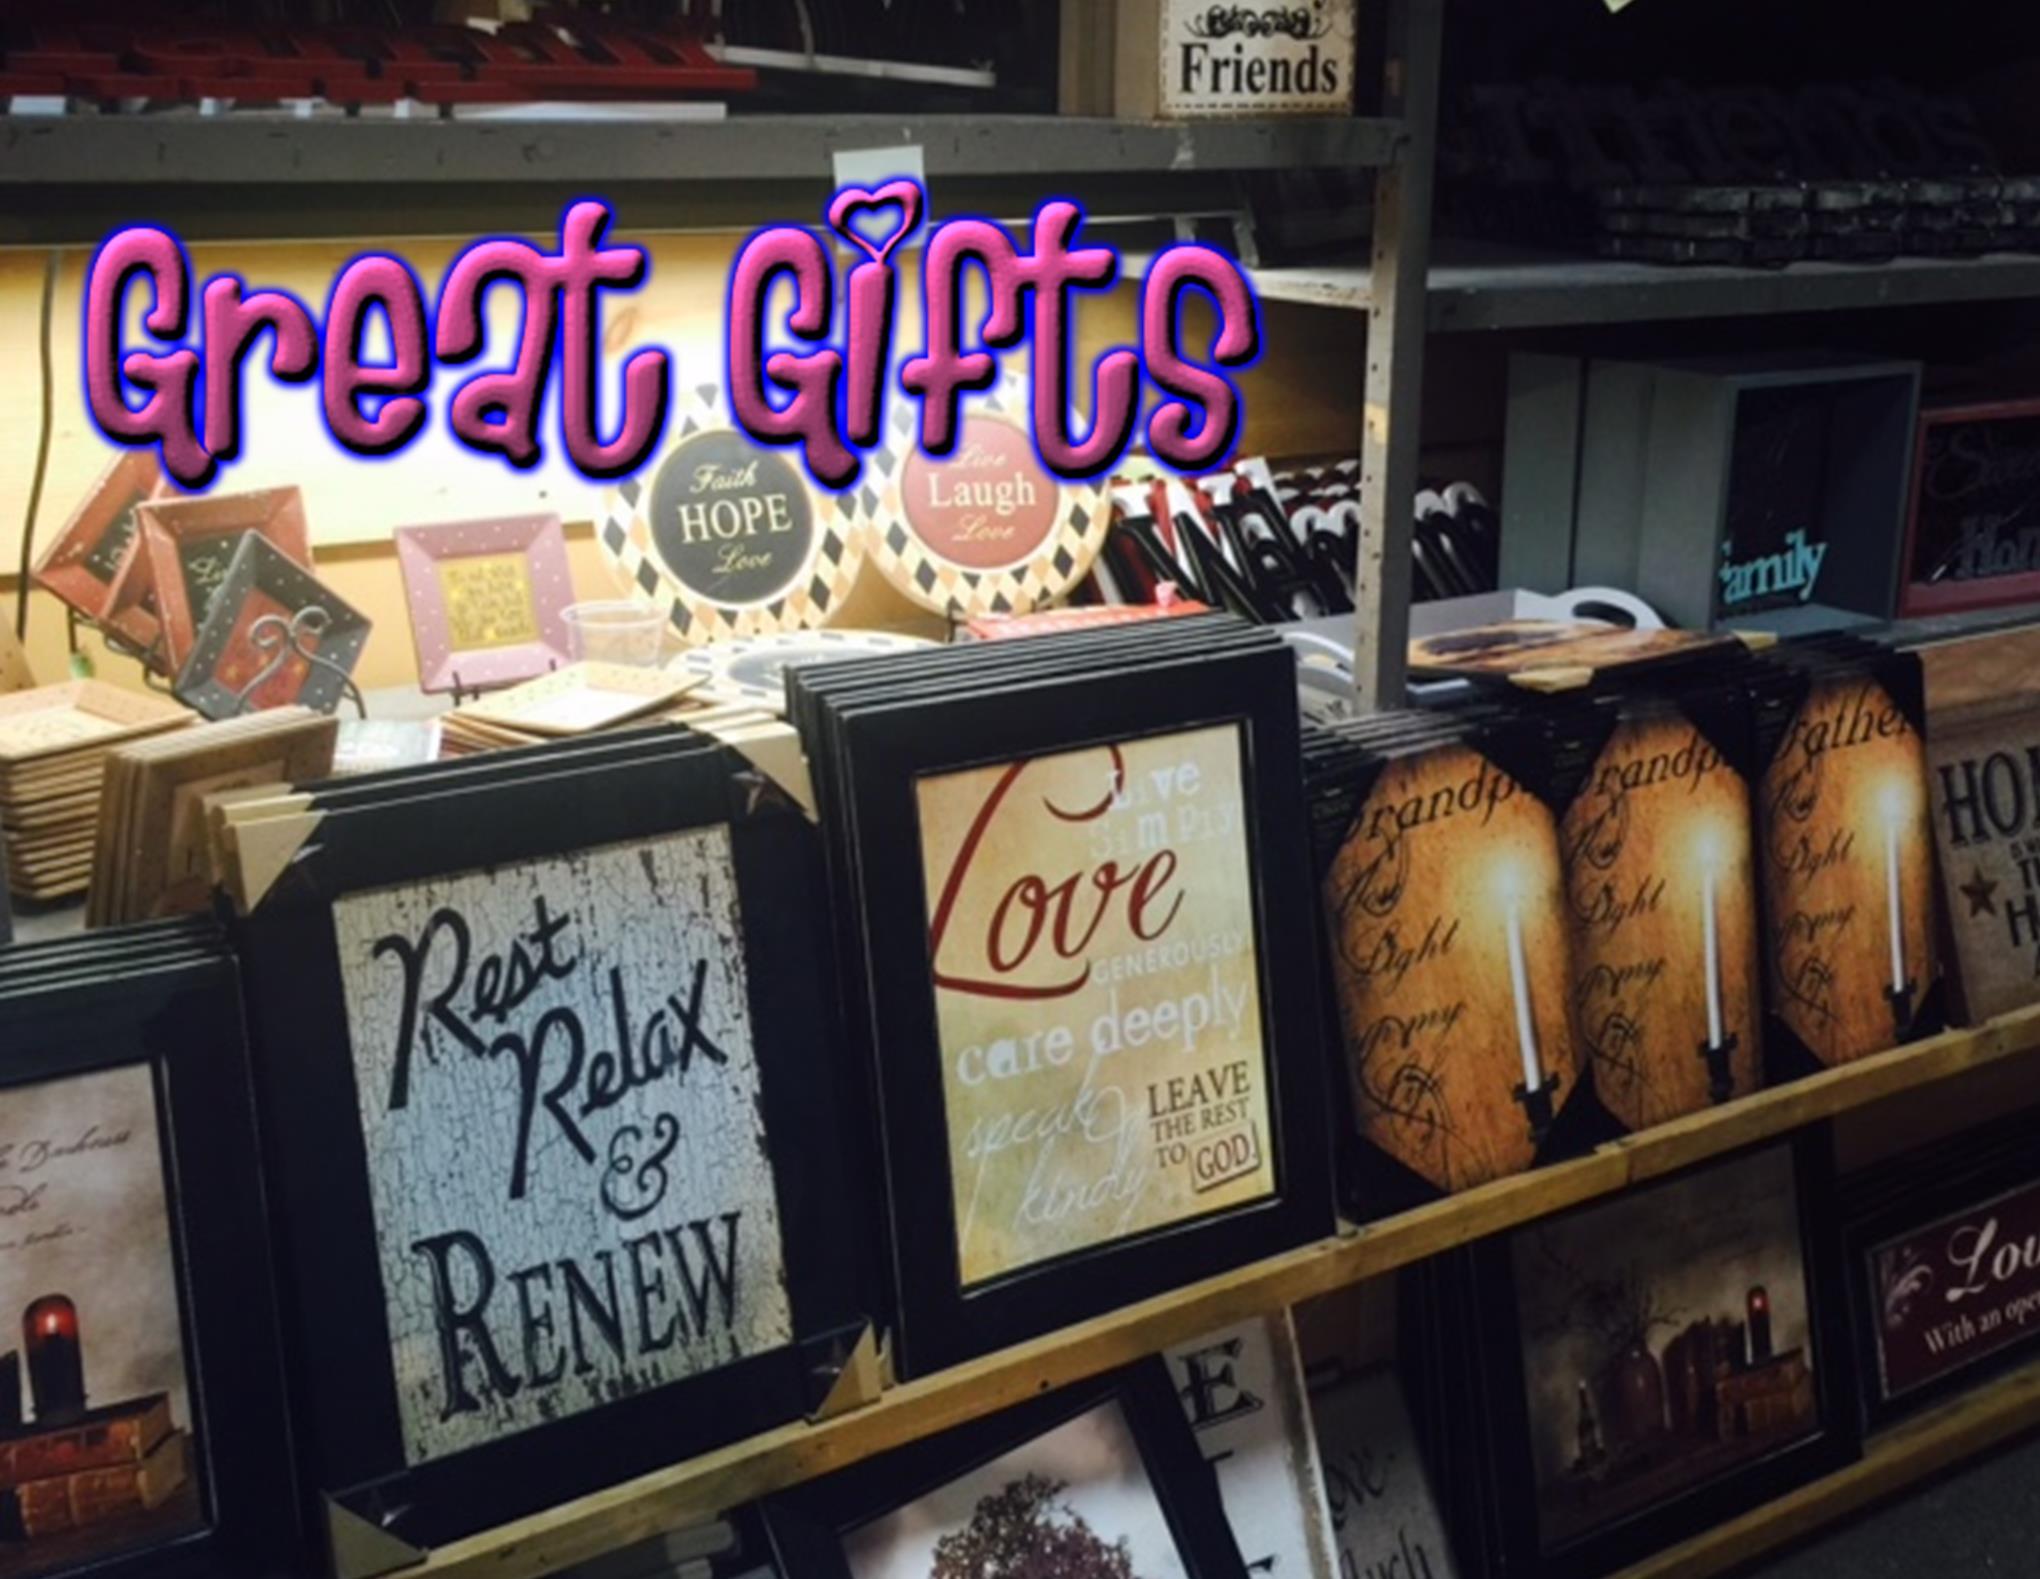 CJ promo great gifts